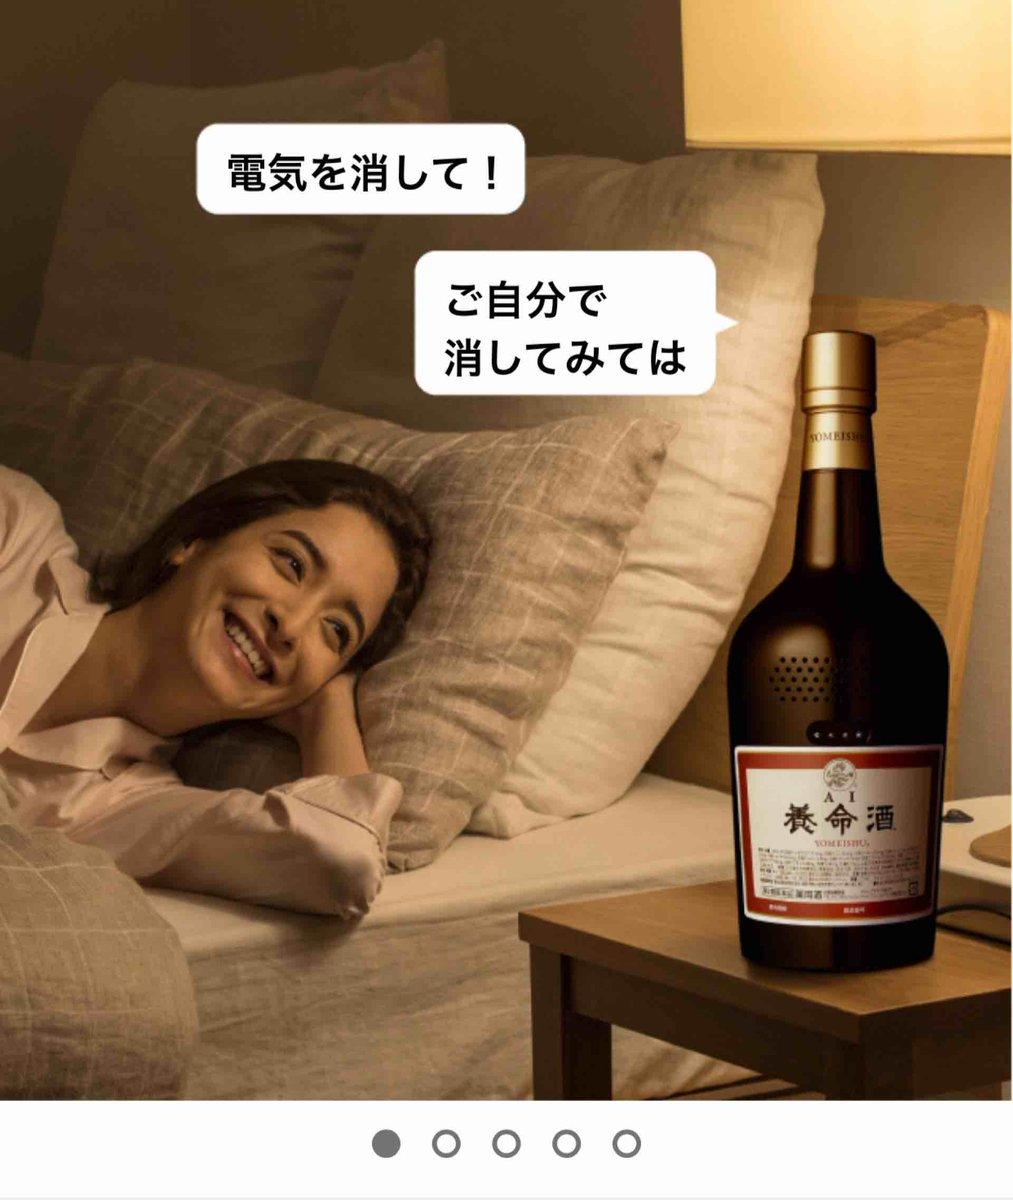 AI養命酒の養命酒スピーカーが笑いとりにきすぎてて卑怯 最高の特徴おまえ!!?